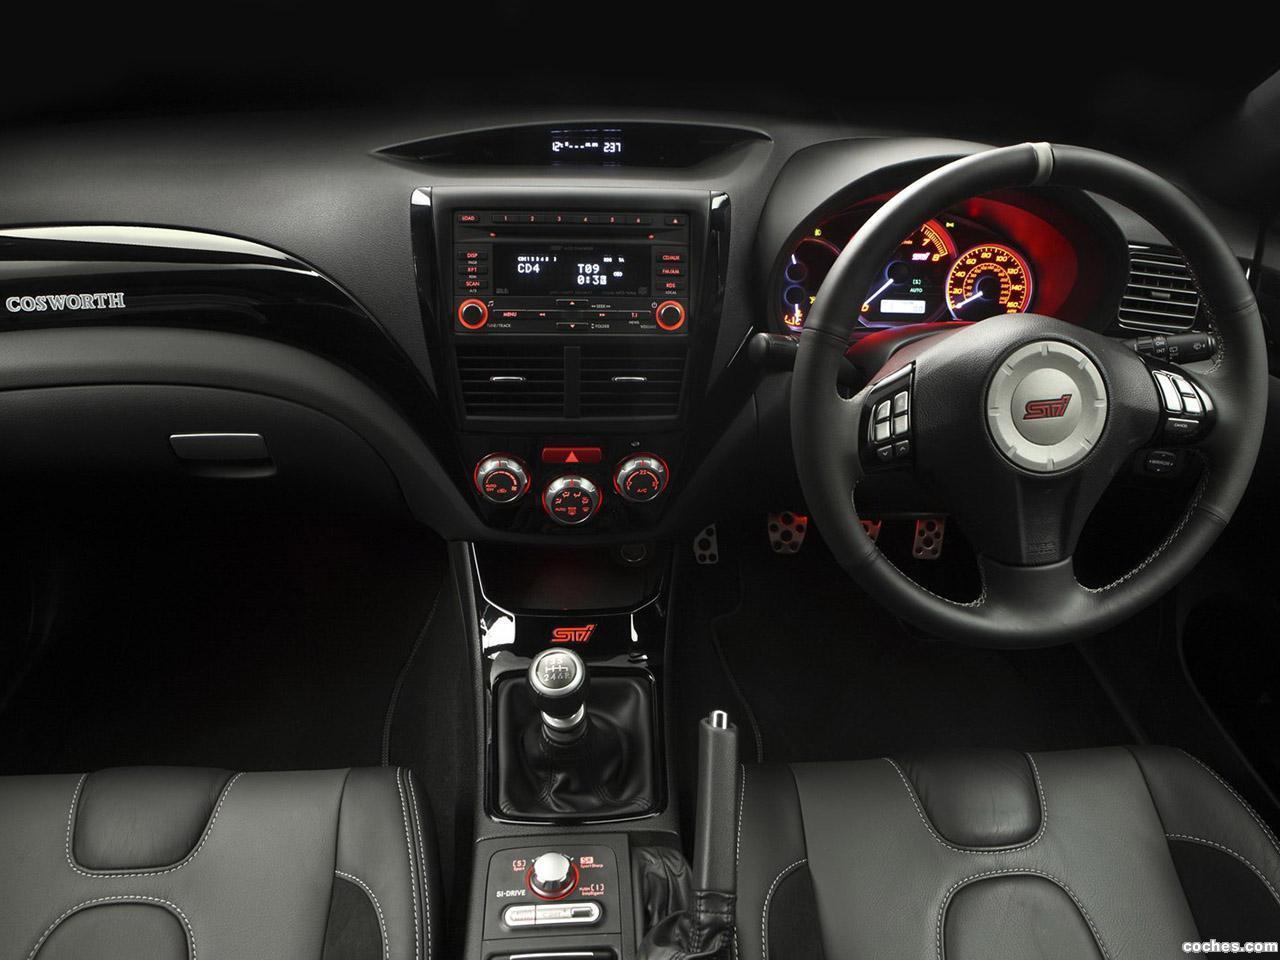 Foto 4 de Subaru Impreza Cosworth STi CS400 UK 2010